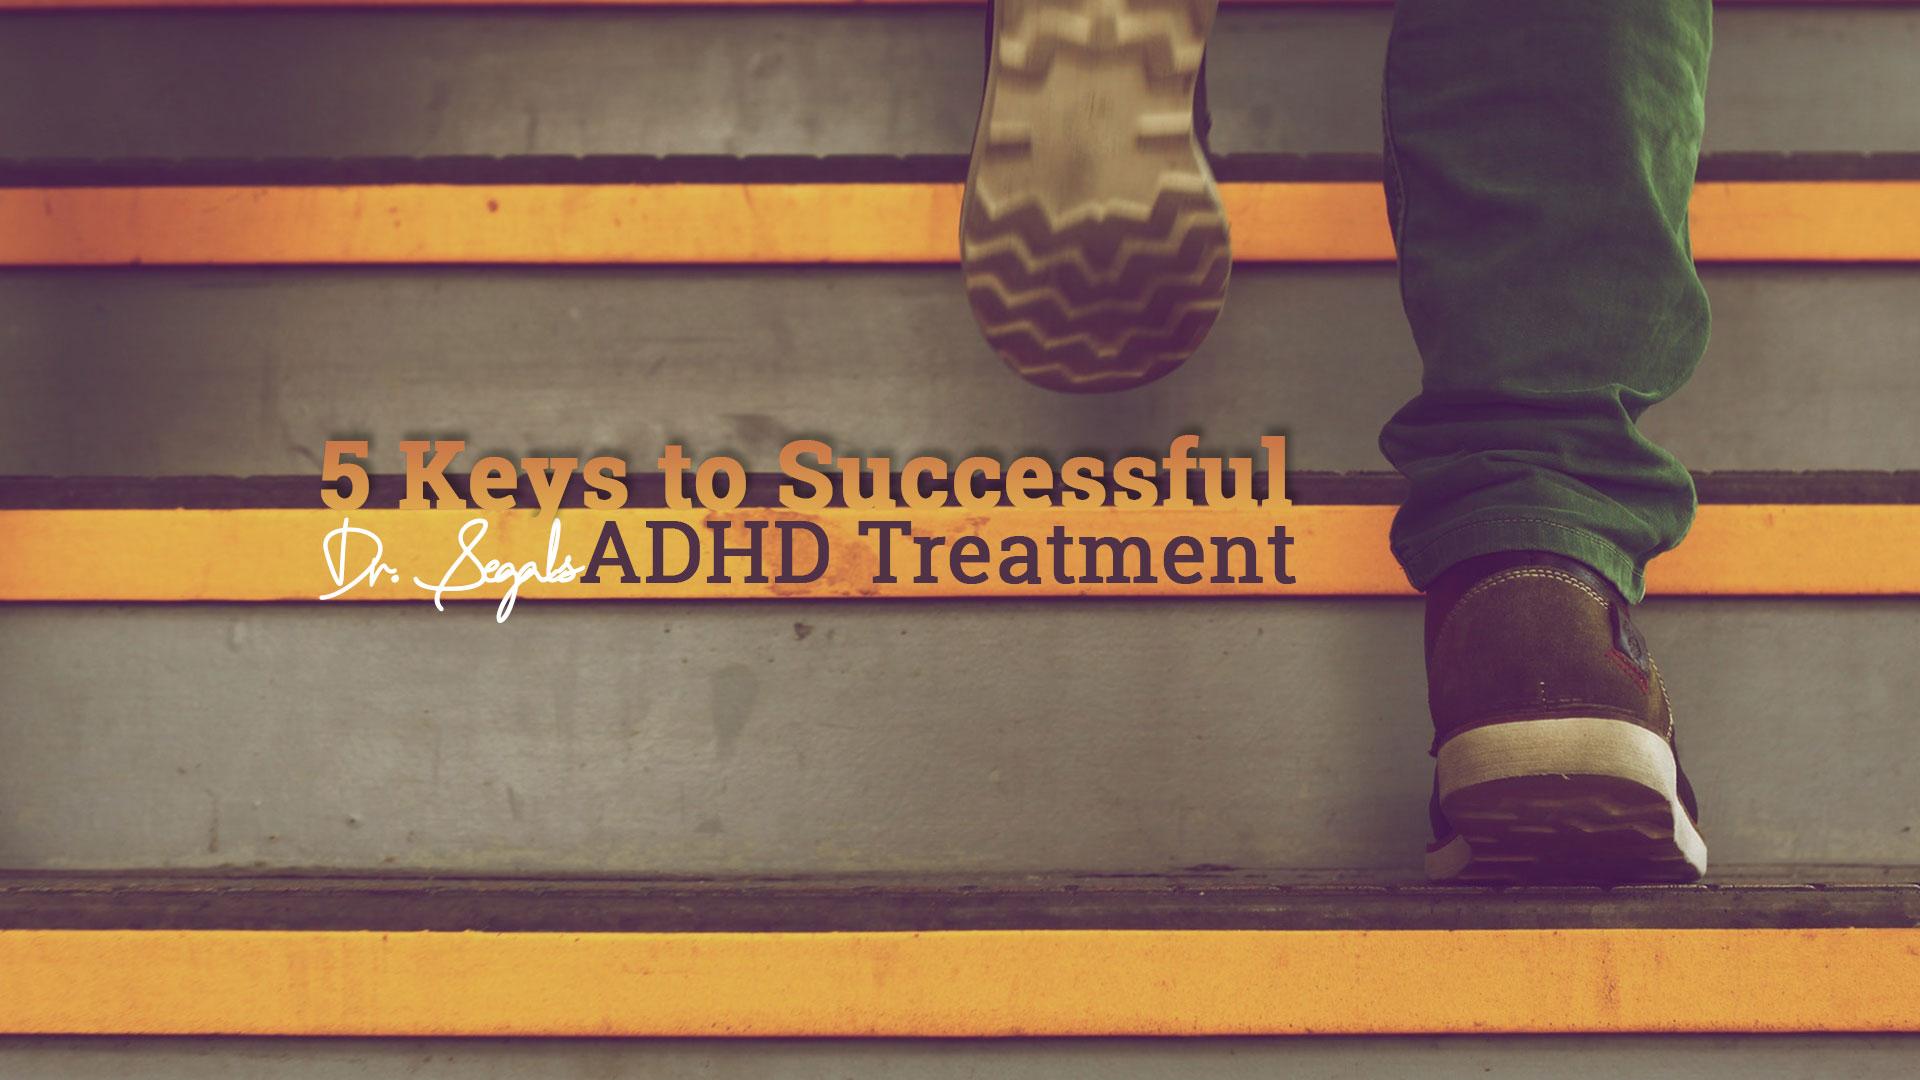 Dr. Segal's 5 Keys to Successful ADHD Treatment